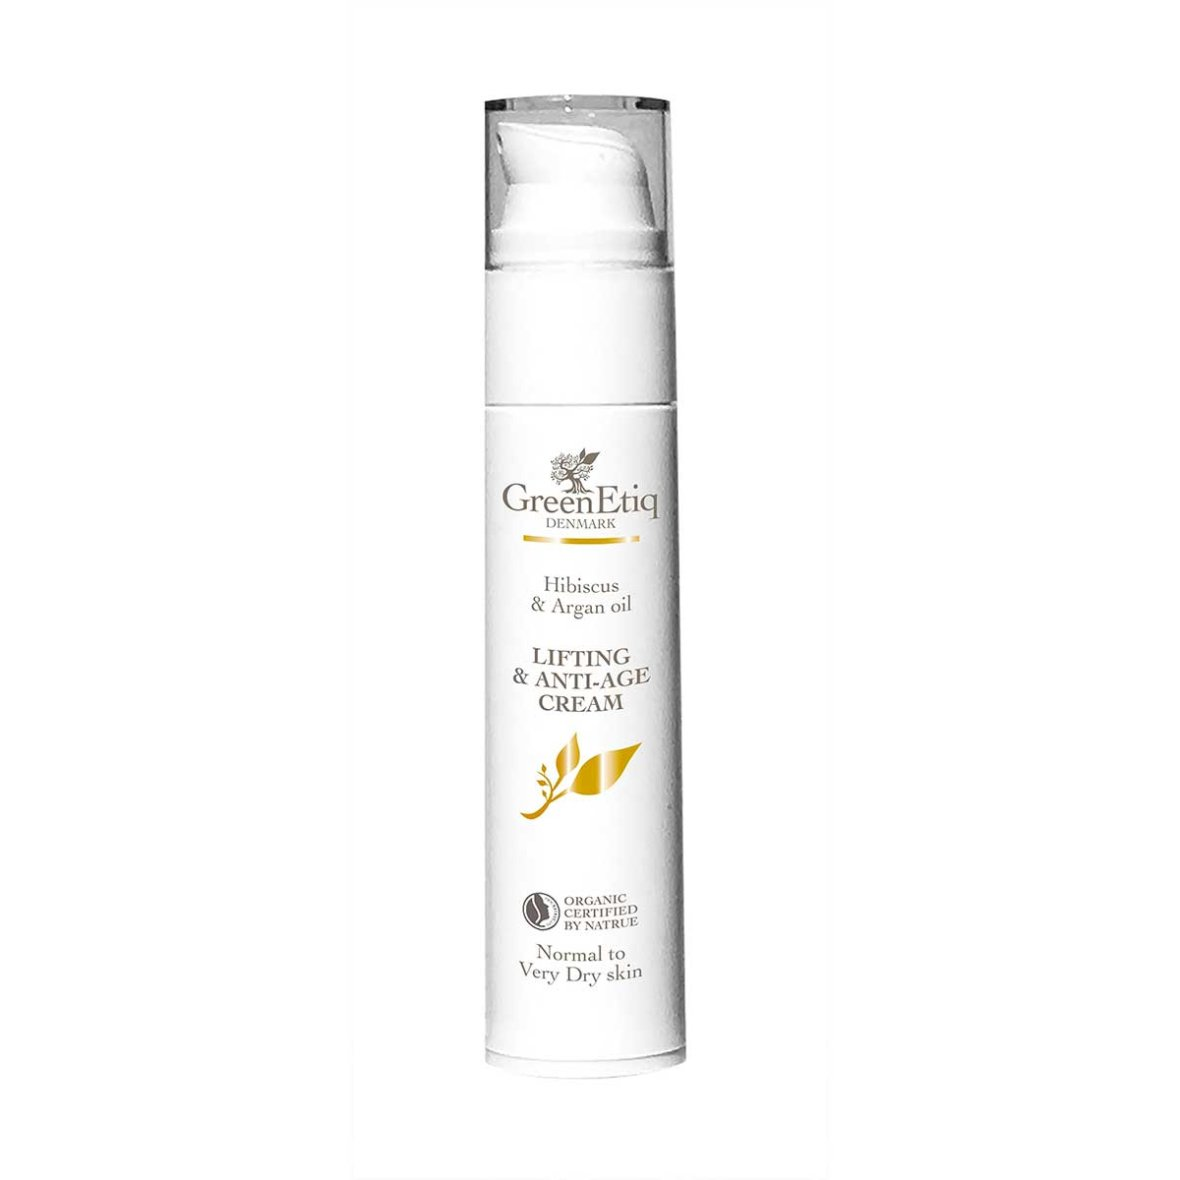 Green Etiq AntiAge & Lifting Cream 50 ml. EXCLUSIVE